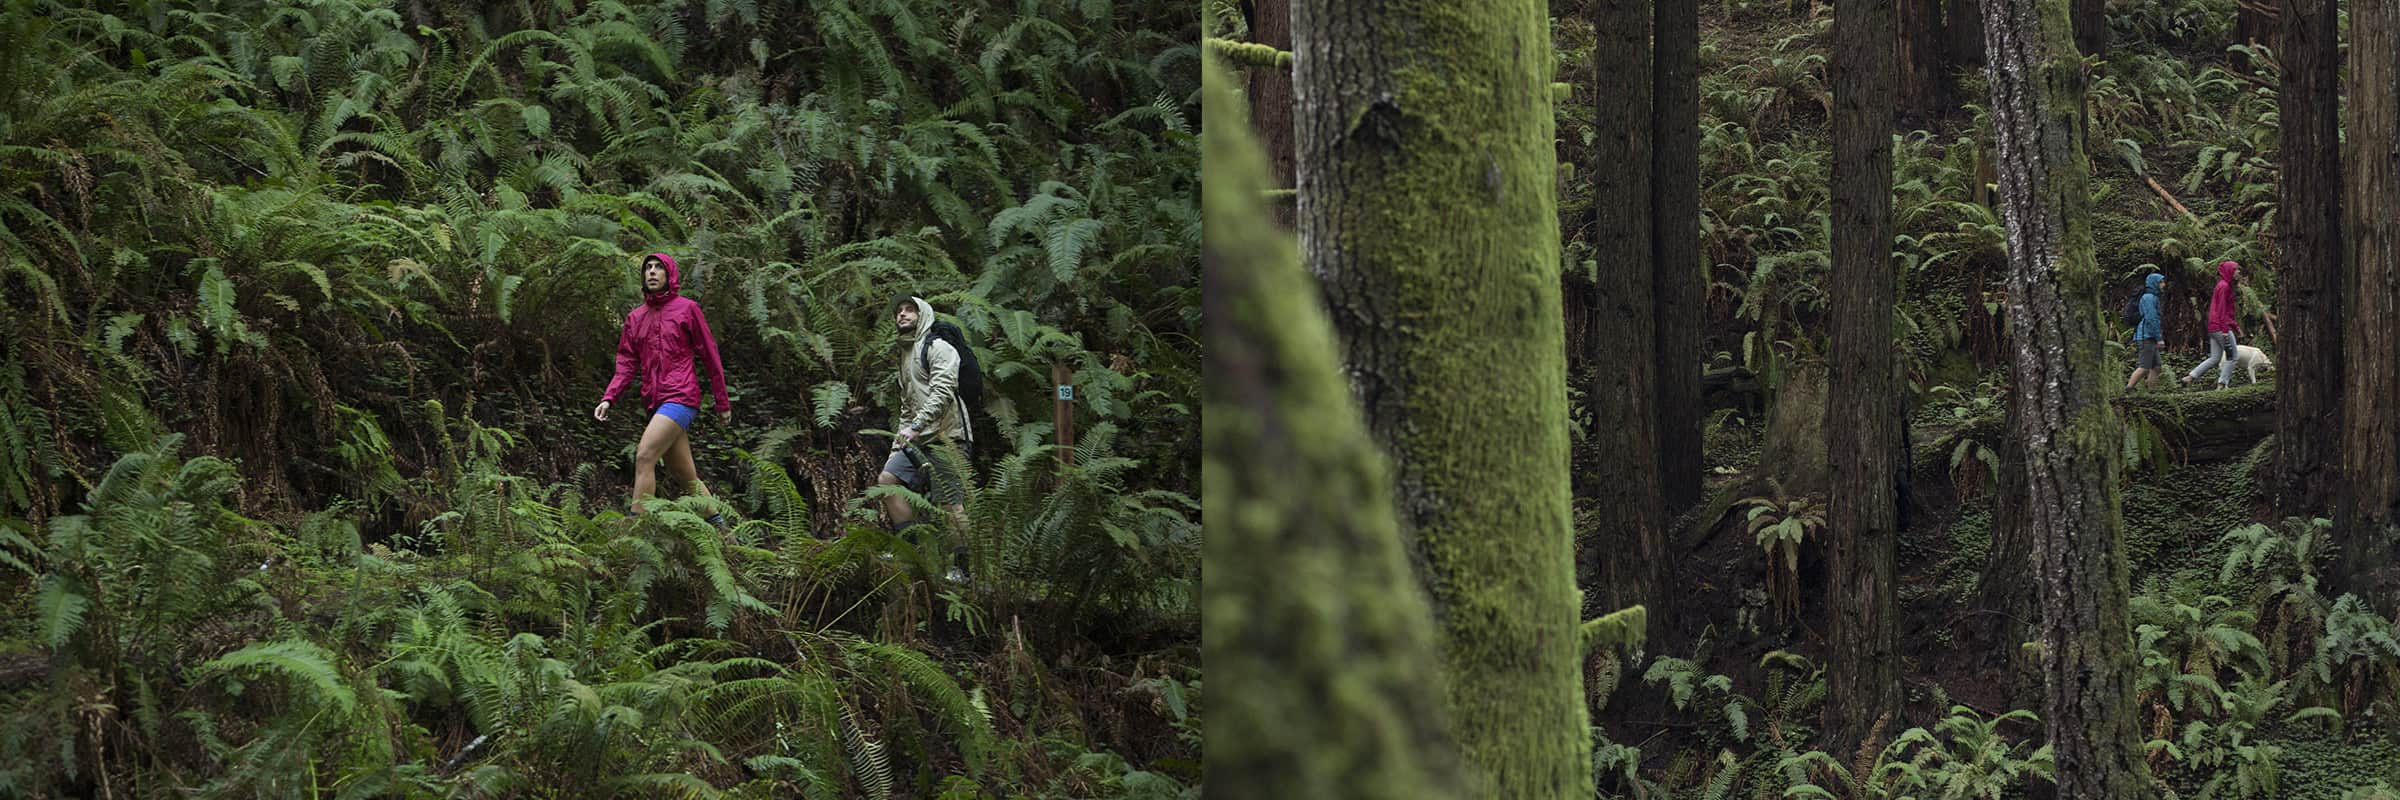 exploring rainforest